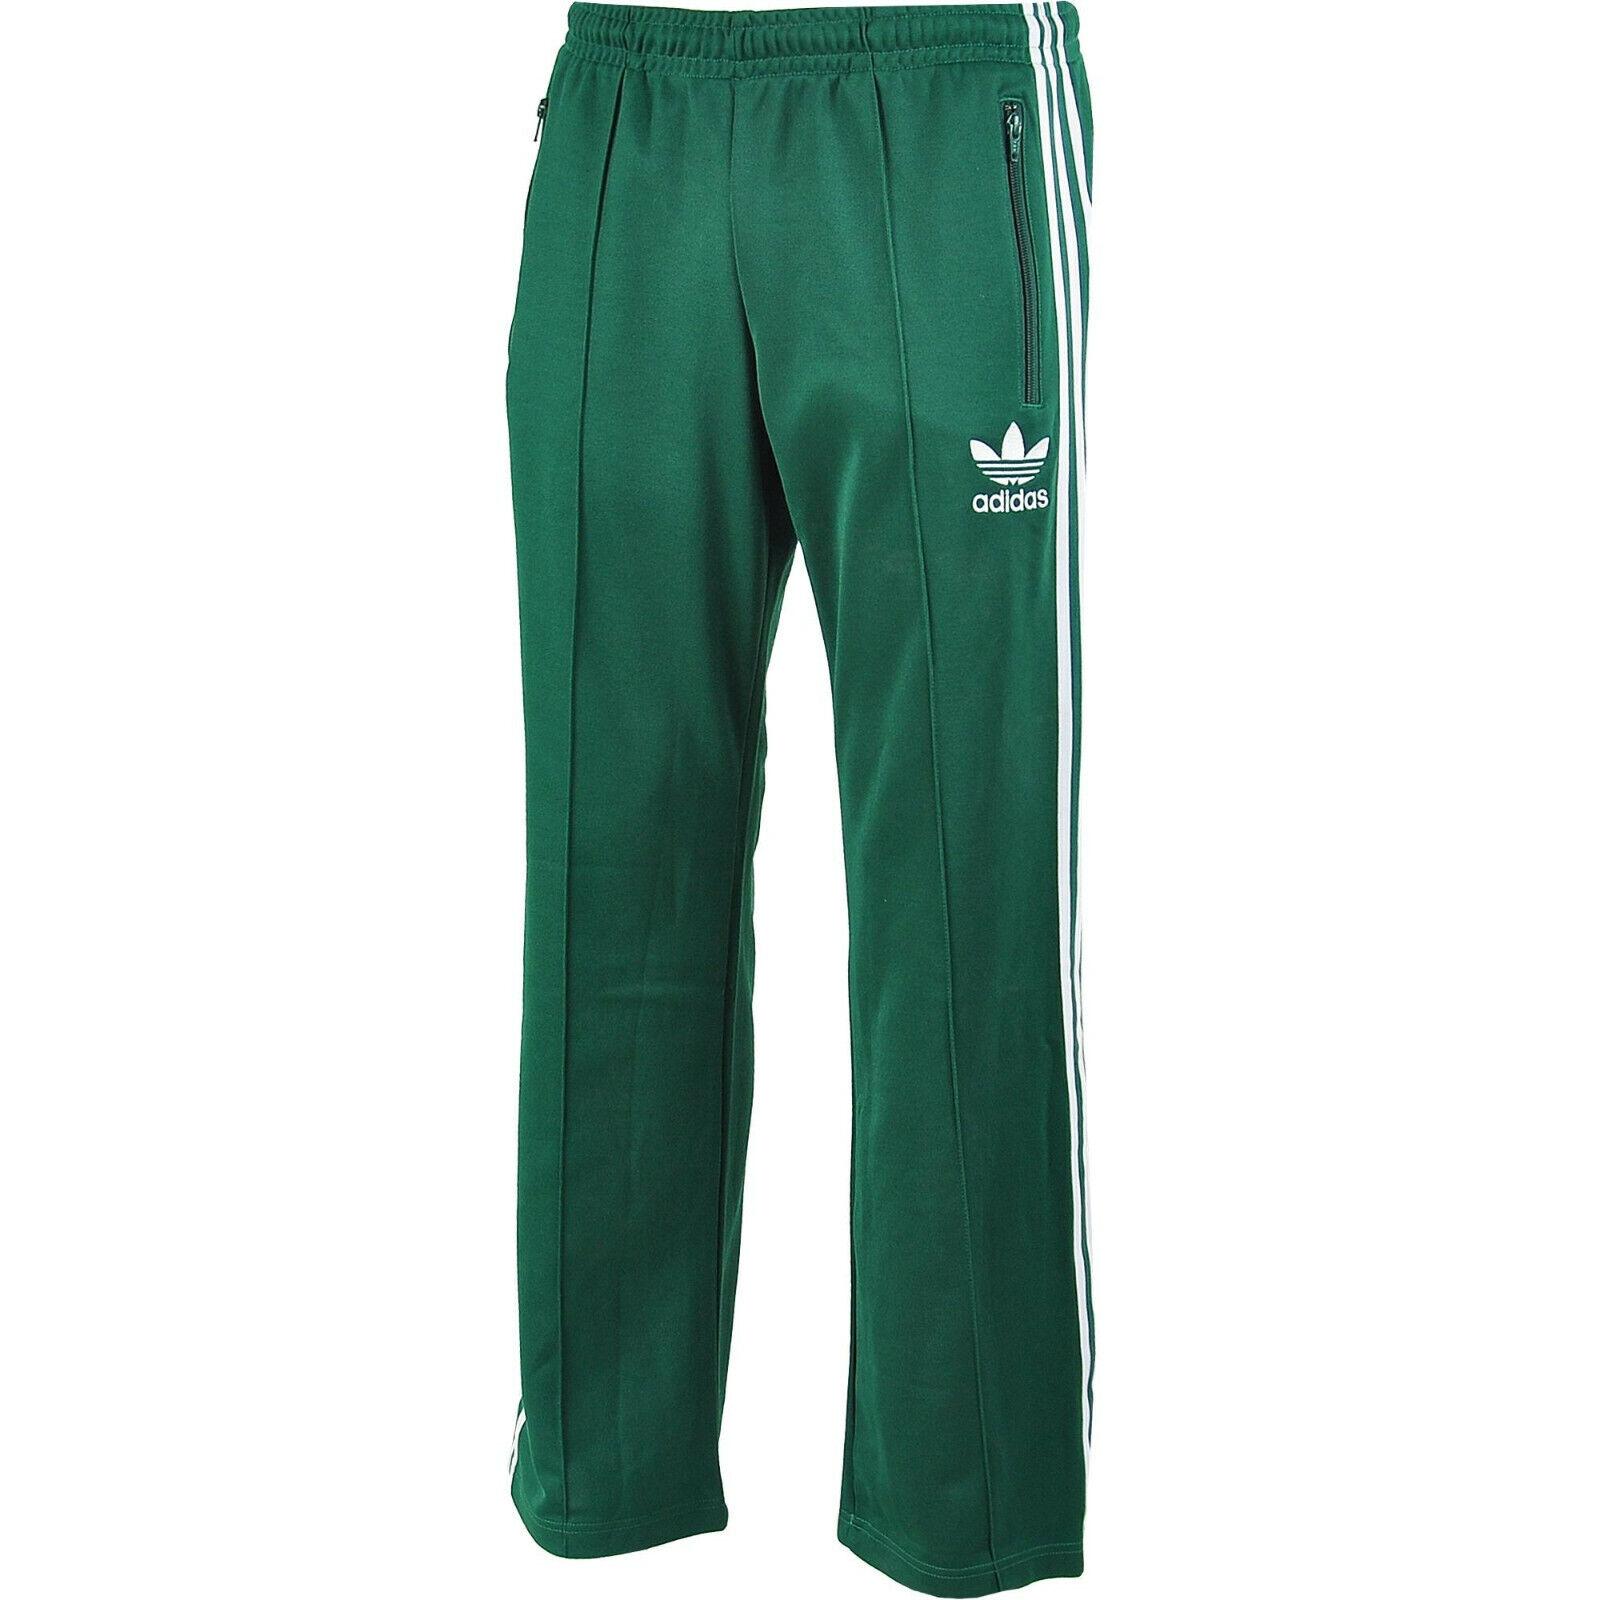 Adidas Europe Pantalon [ Gr. XXS M] Homme Jogging Survêtement Vert Neuf &